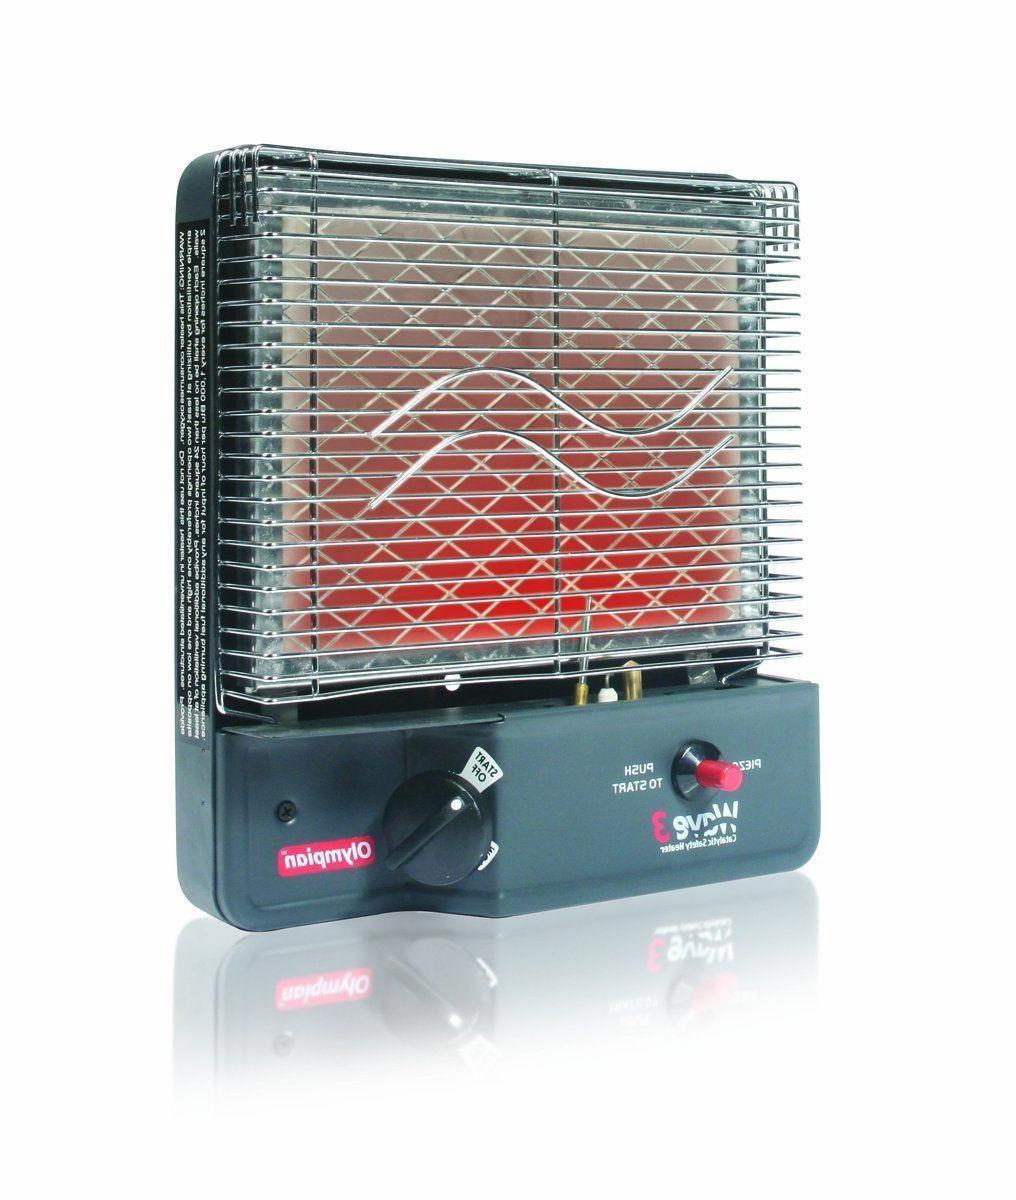 Olympian Portable Catalytic Heater 3000 BTU 57331